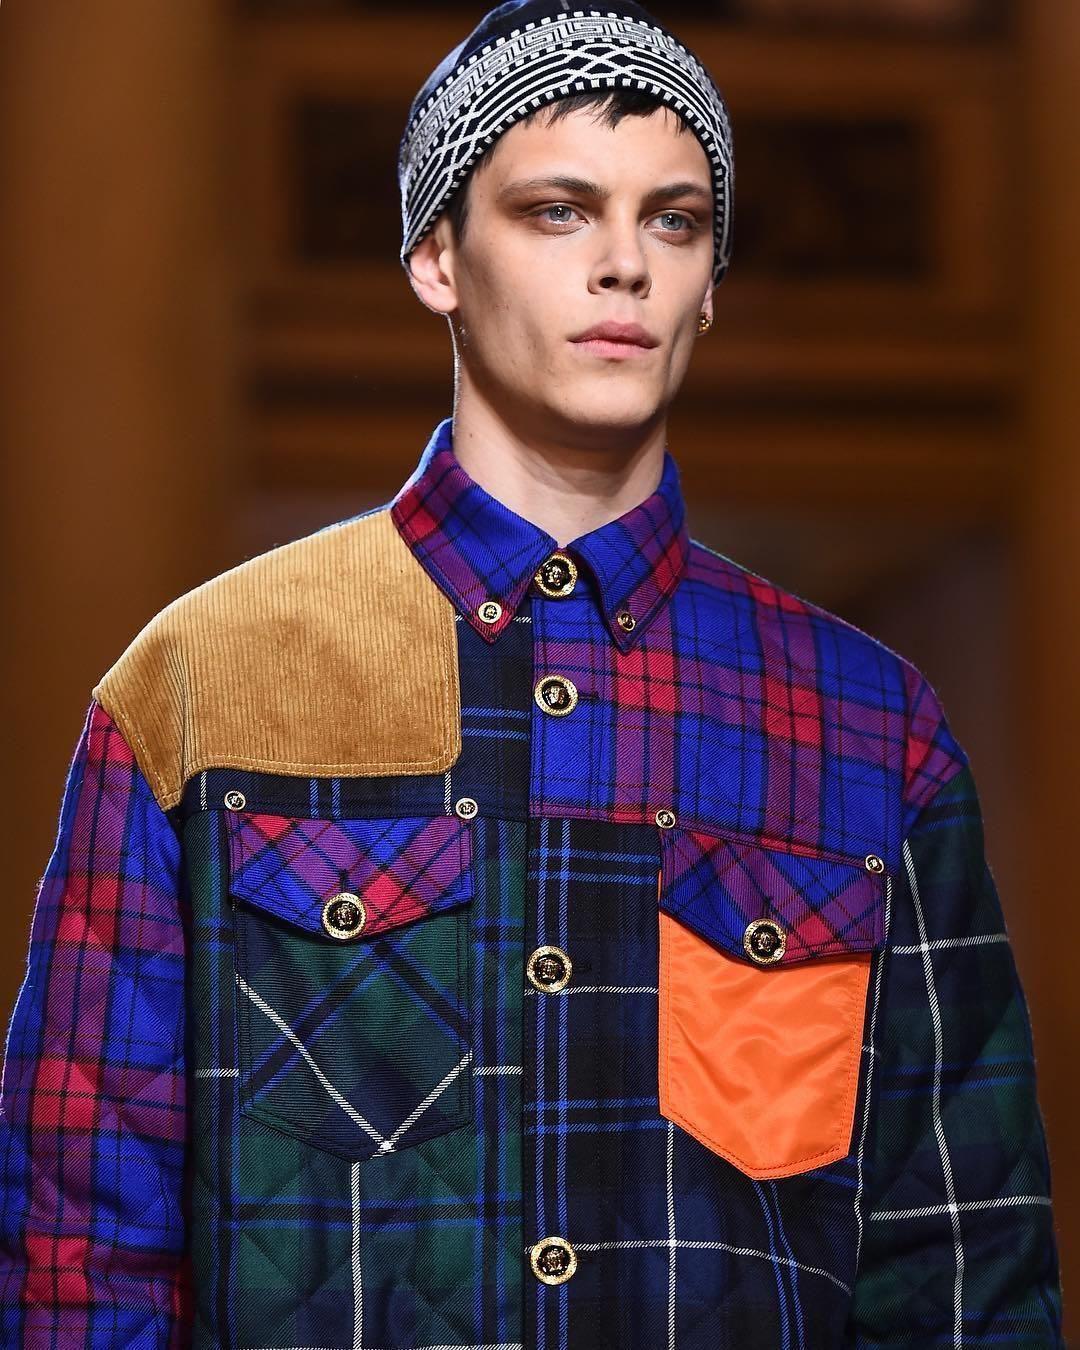 f75c8e9f946f  wishlist  1111  streetstyle  fallfashion from  Versace s closet  versace.  Quilted tartan printed shirt ...